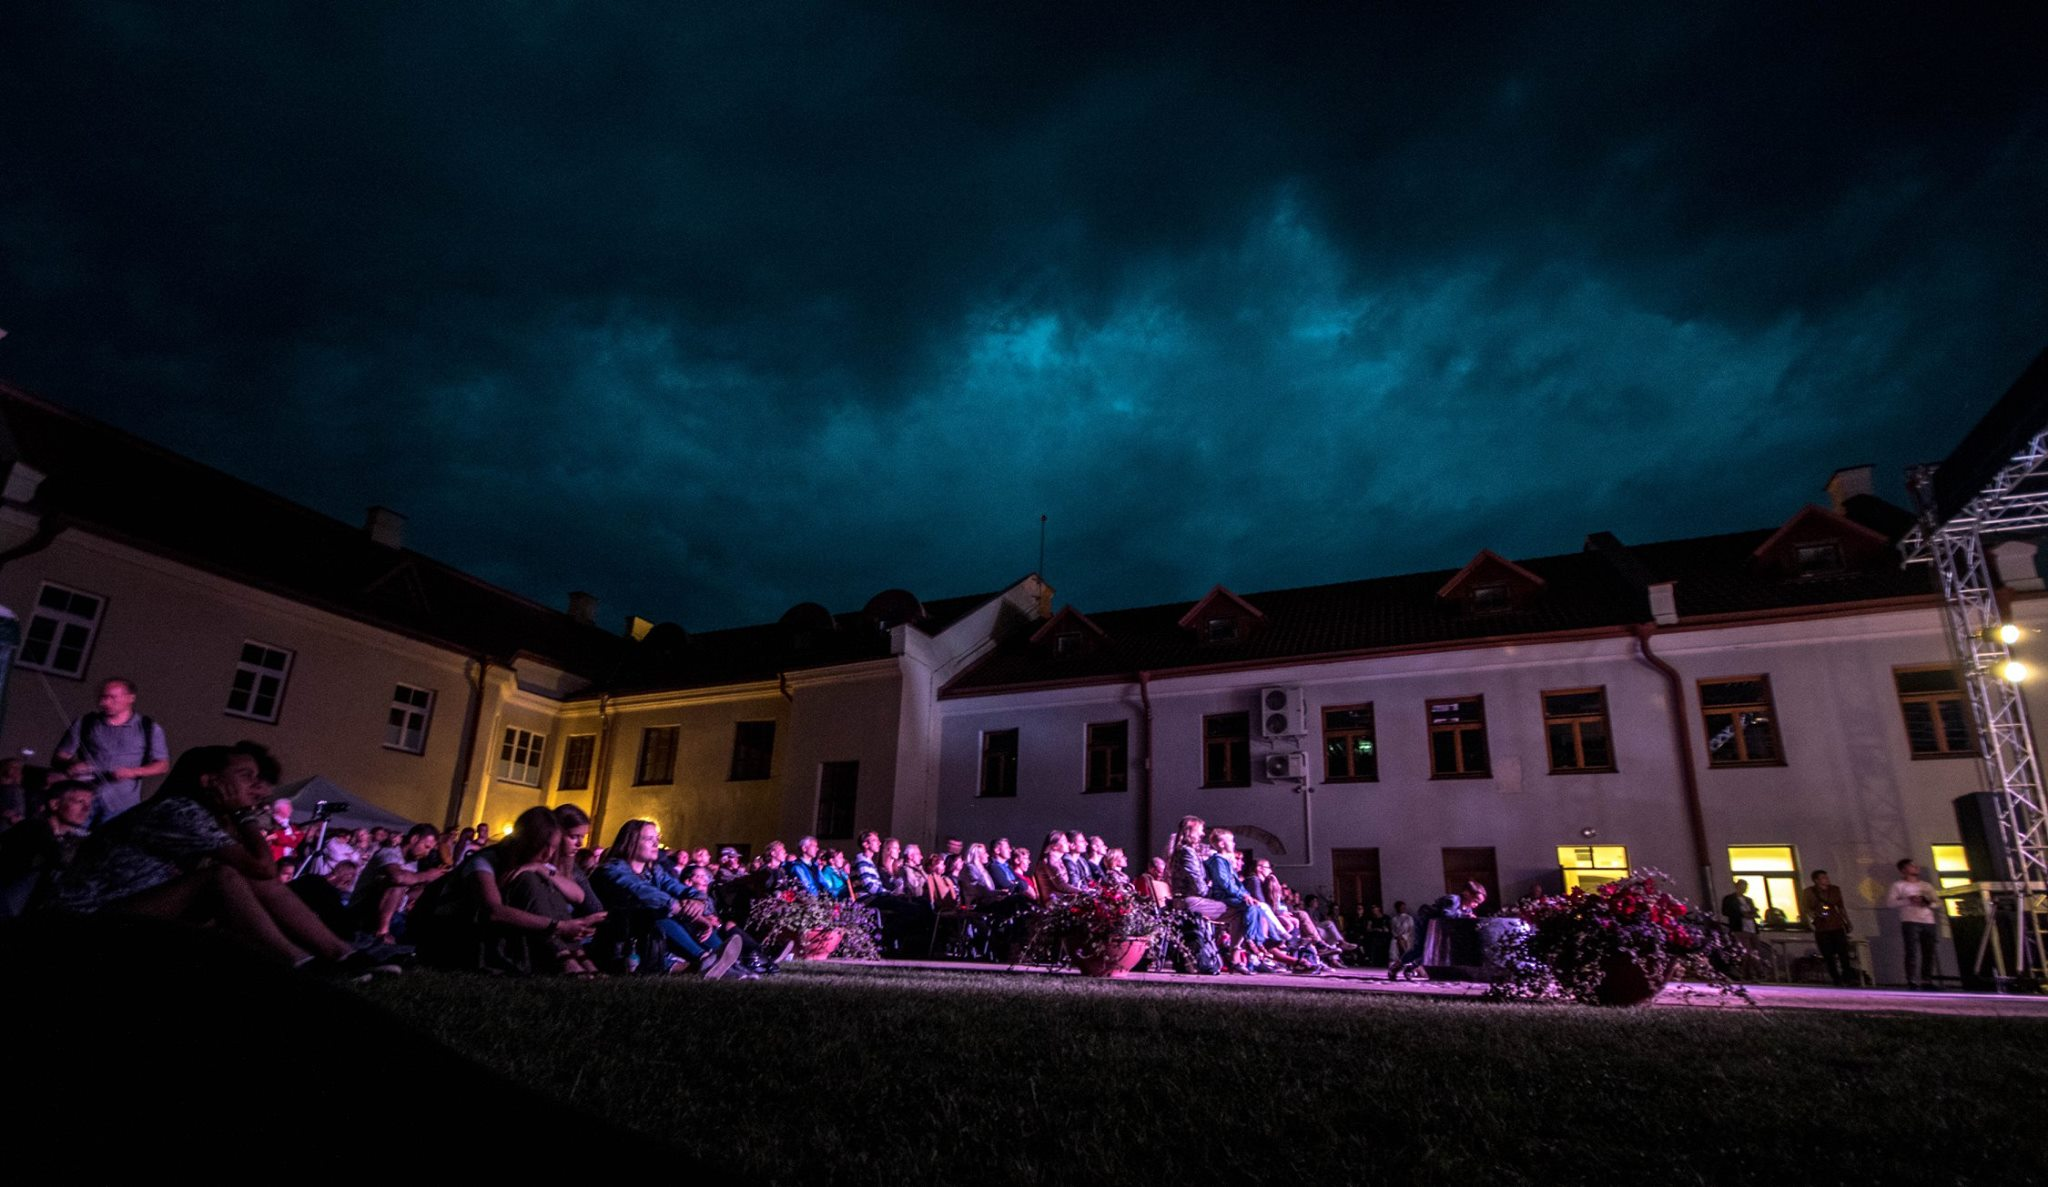 Naktinis koncertas kiemelyje.